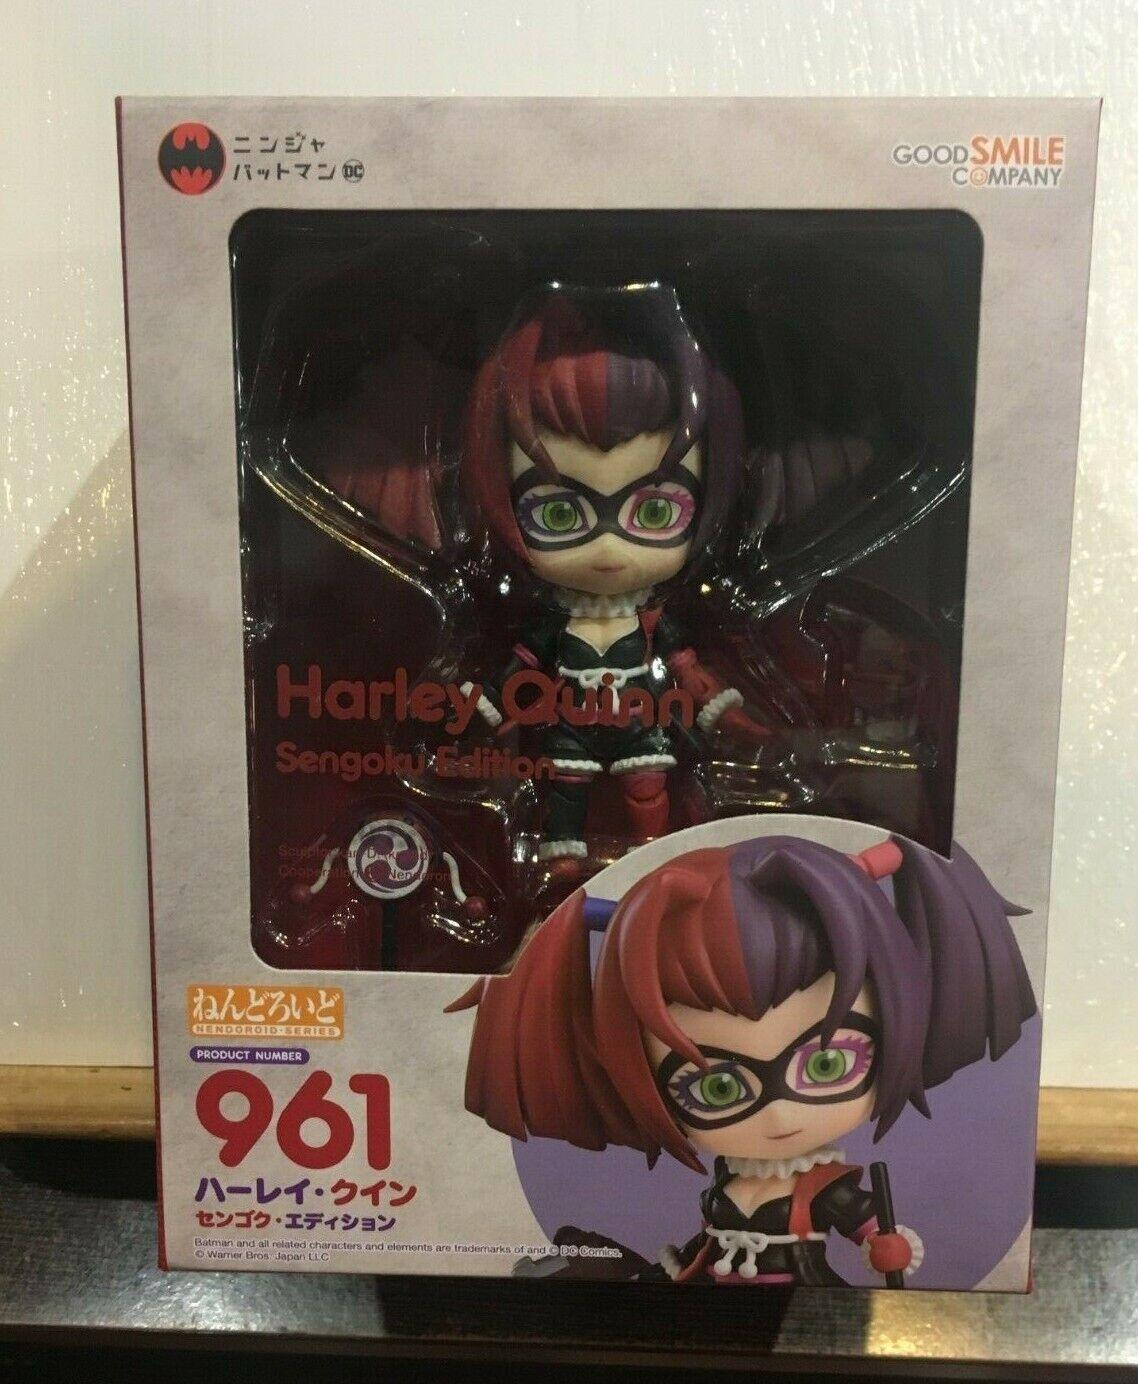 Nendoroid 961 Harley Quinn Sengoku edizione Good Smile azienda JAPAN